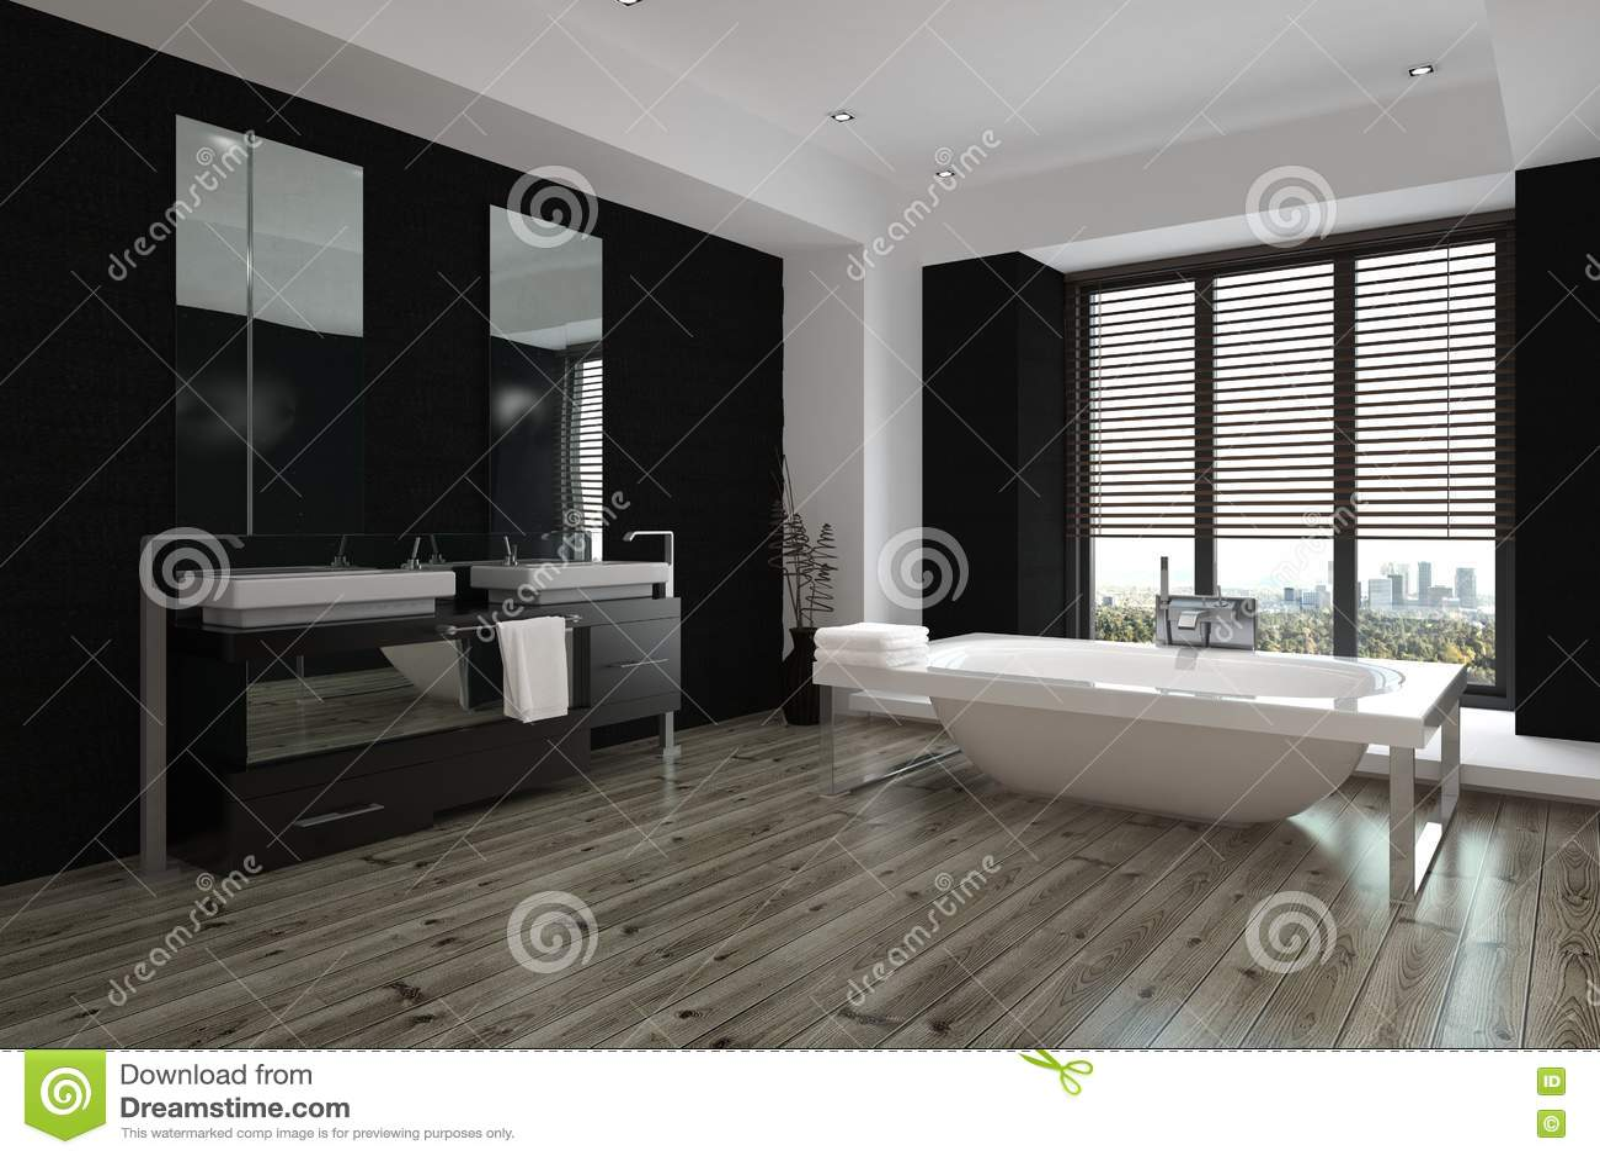 Spacious modern black and white bathroom interior